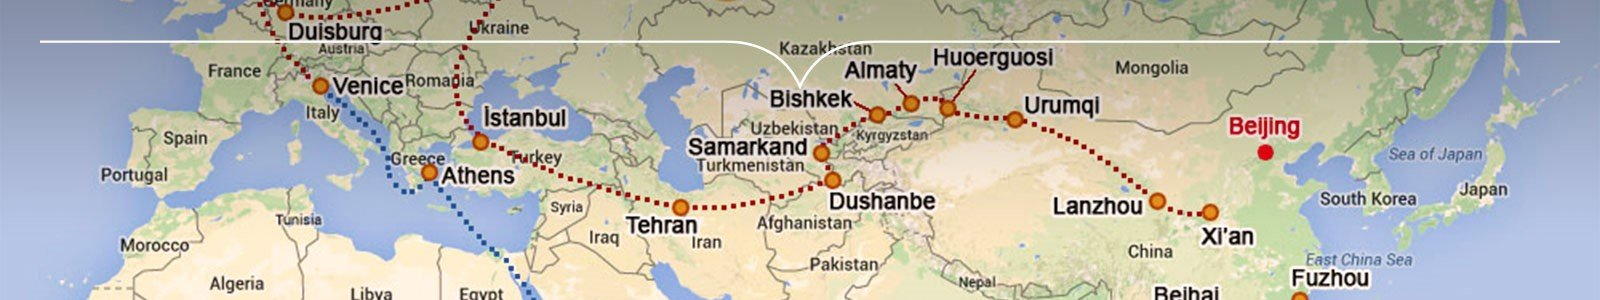 CFGC website header The new Silk Road.jpg